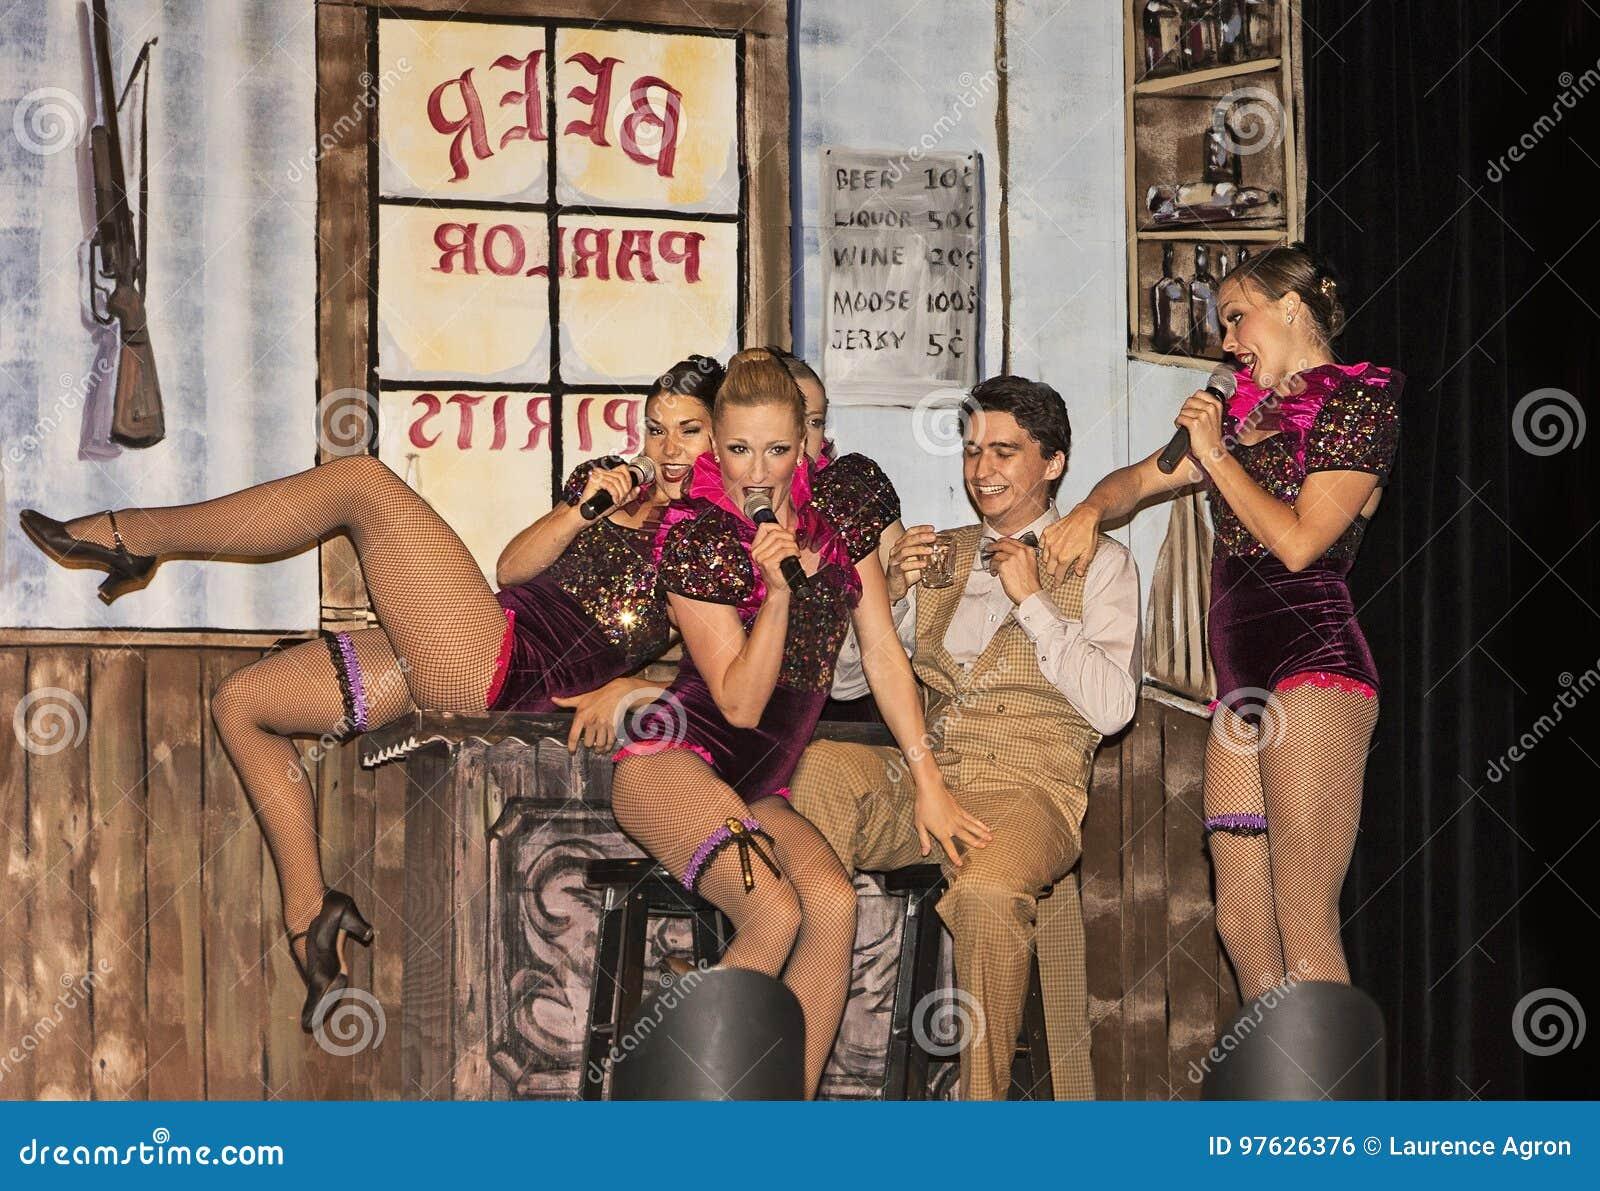 Dancehall Girls Entertain in Skit